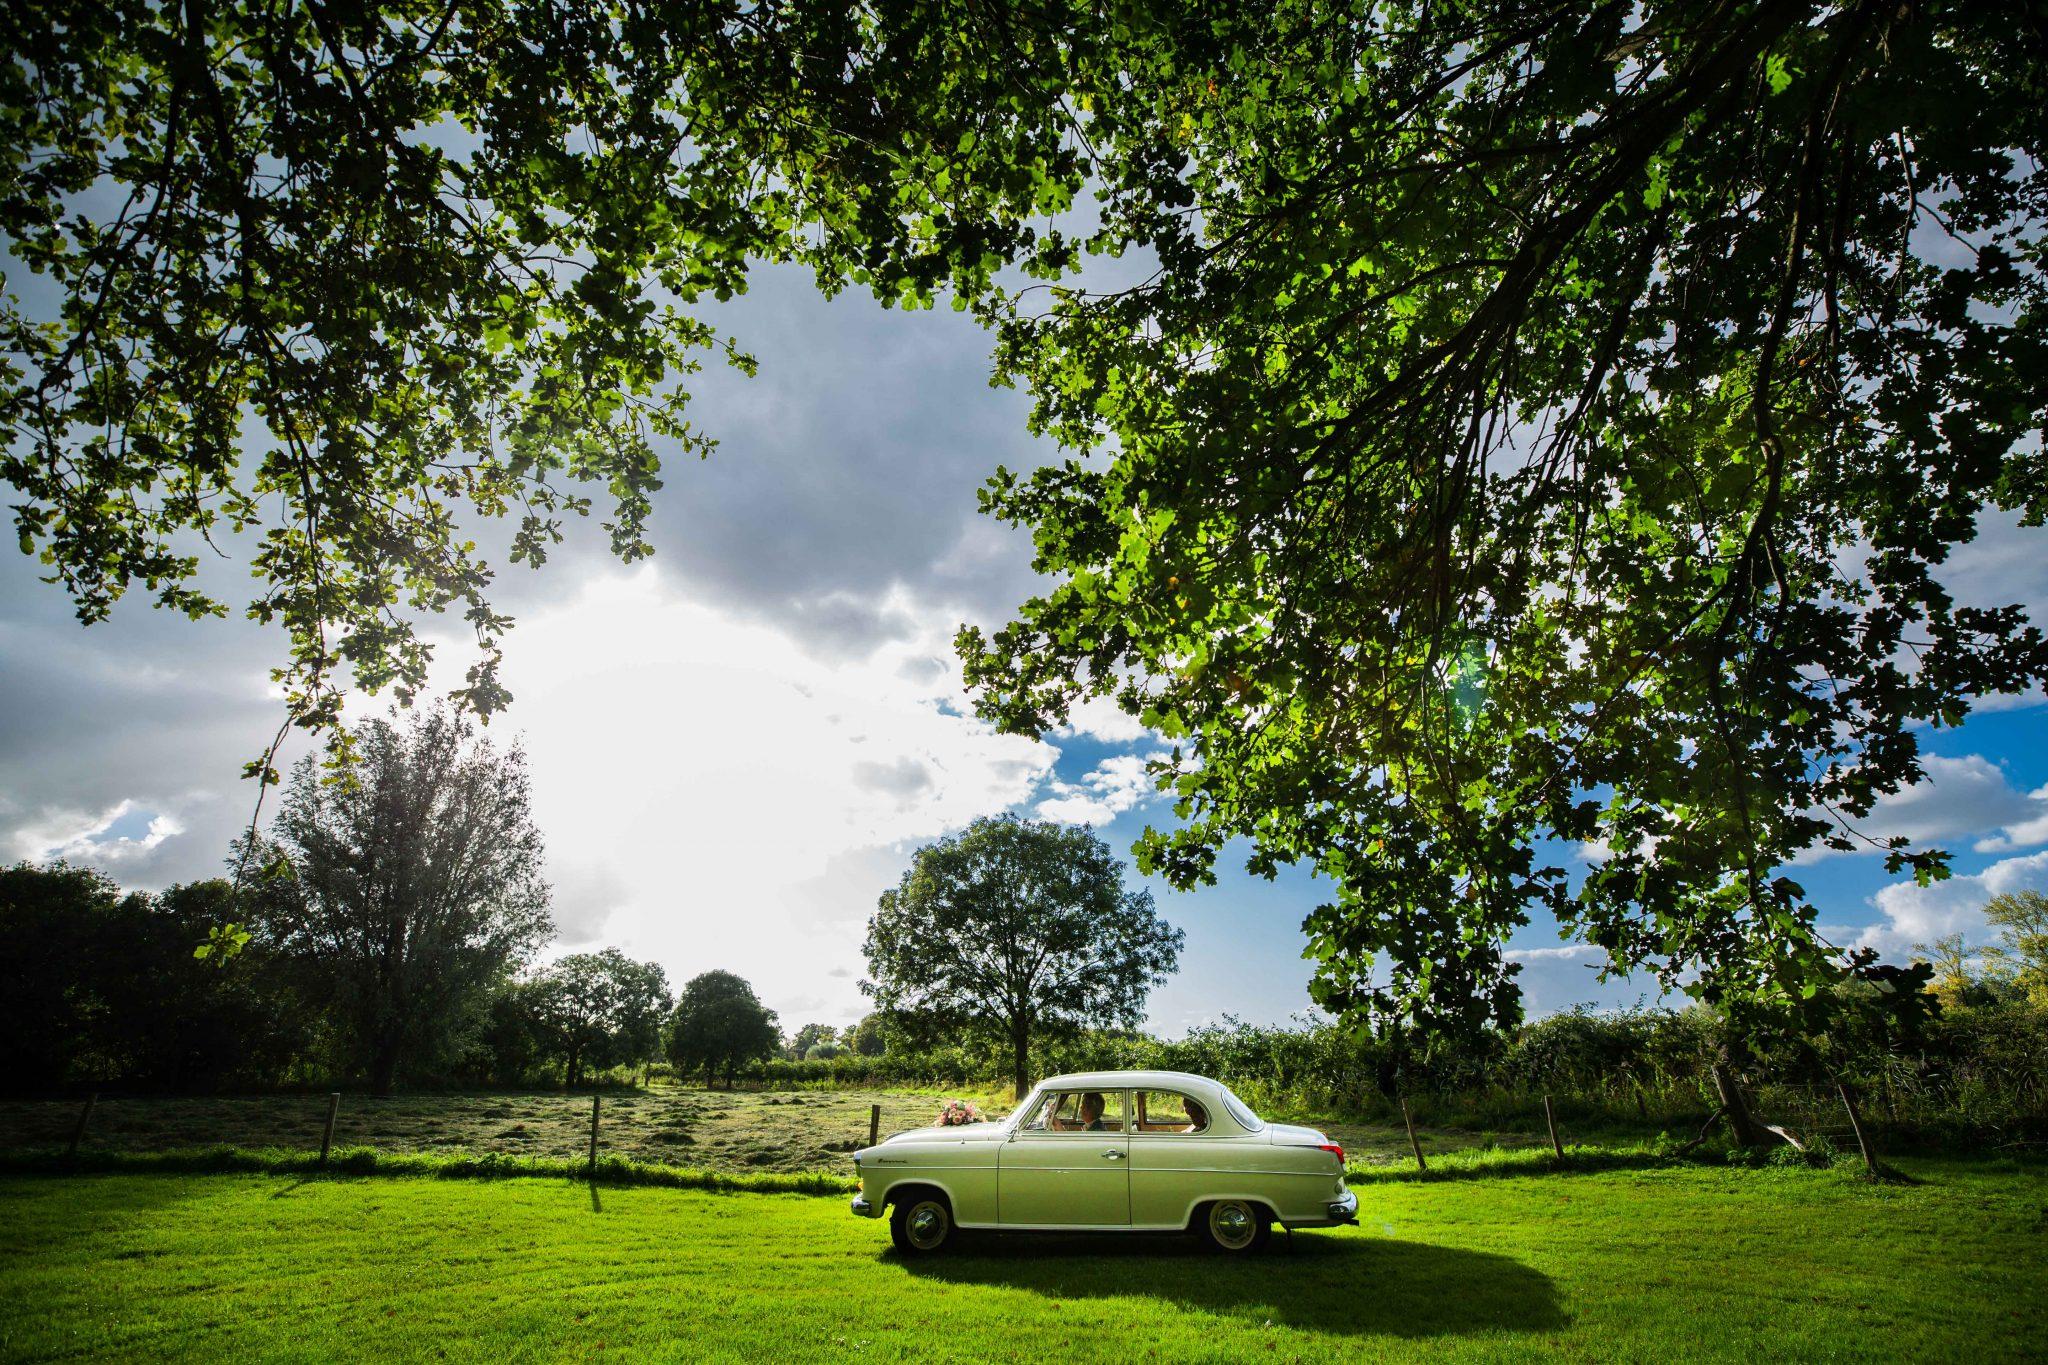 Trouwauto bruidspaar fotoreportage bruiloft